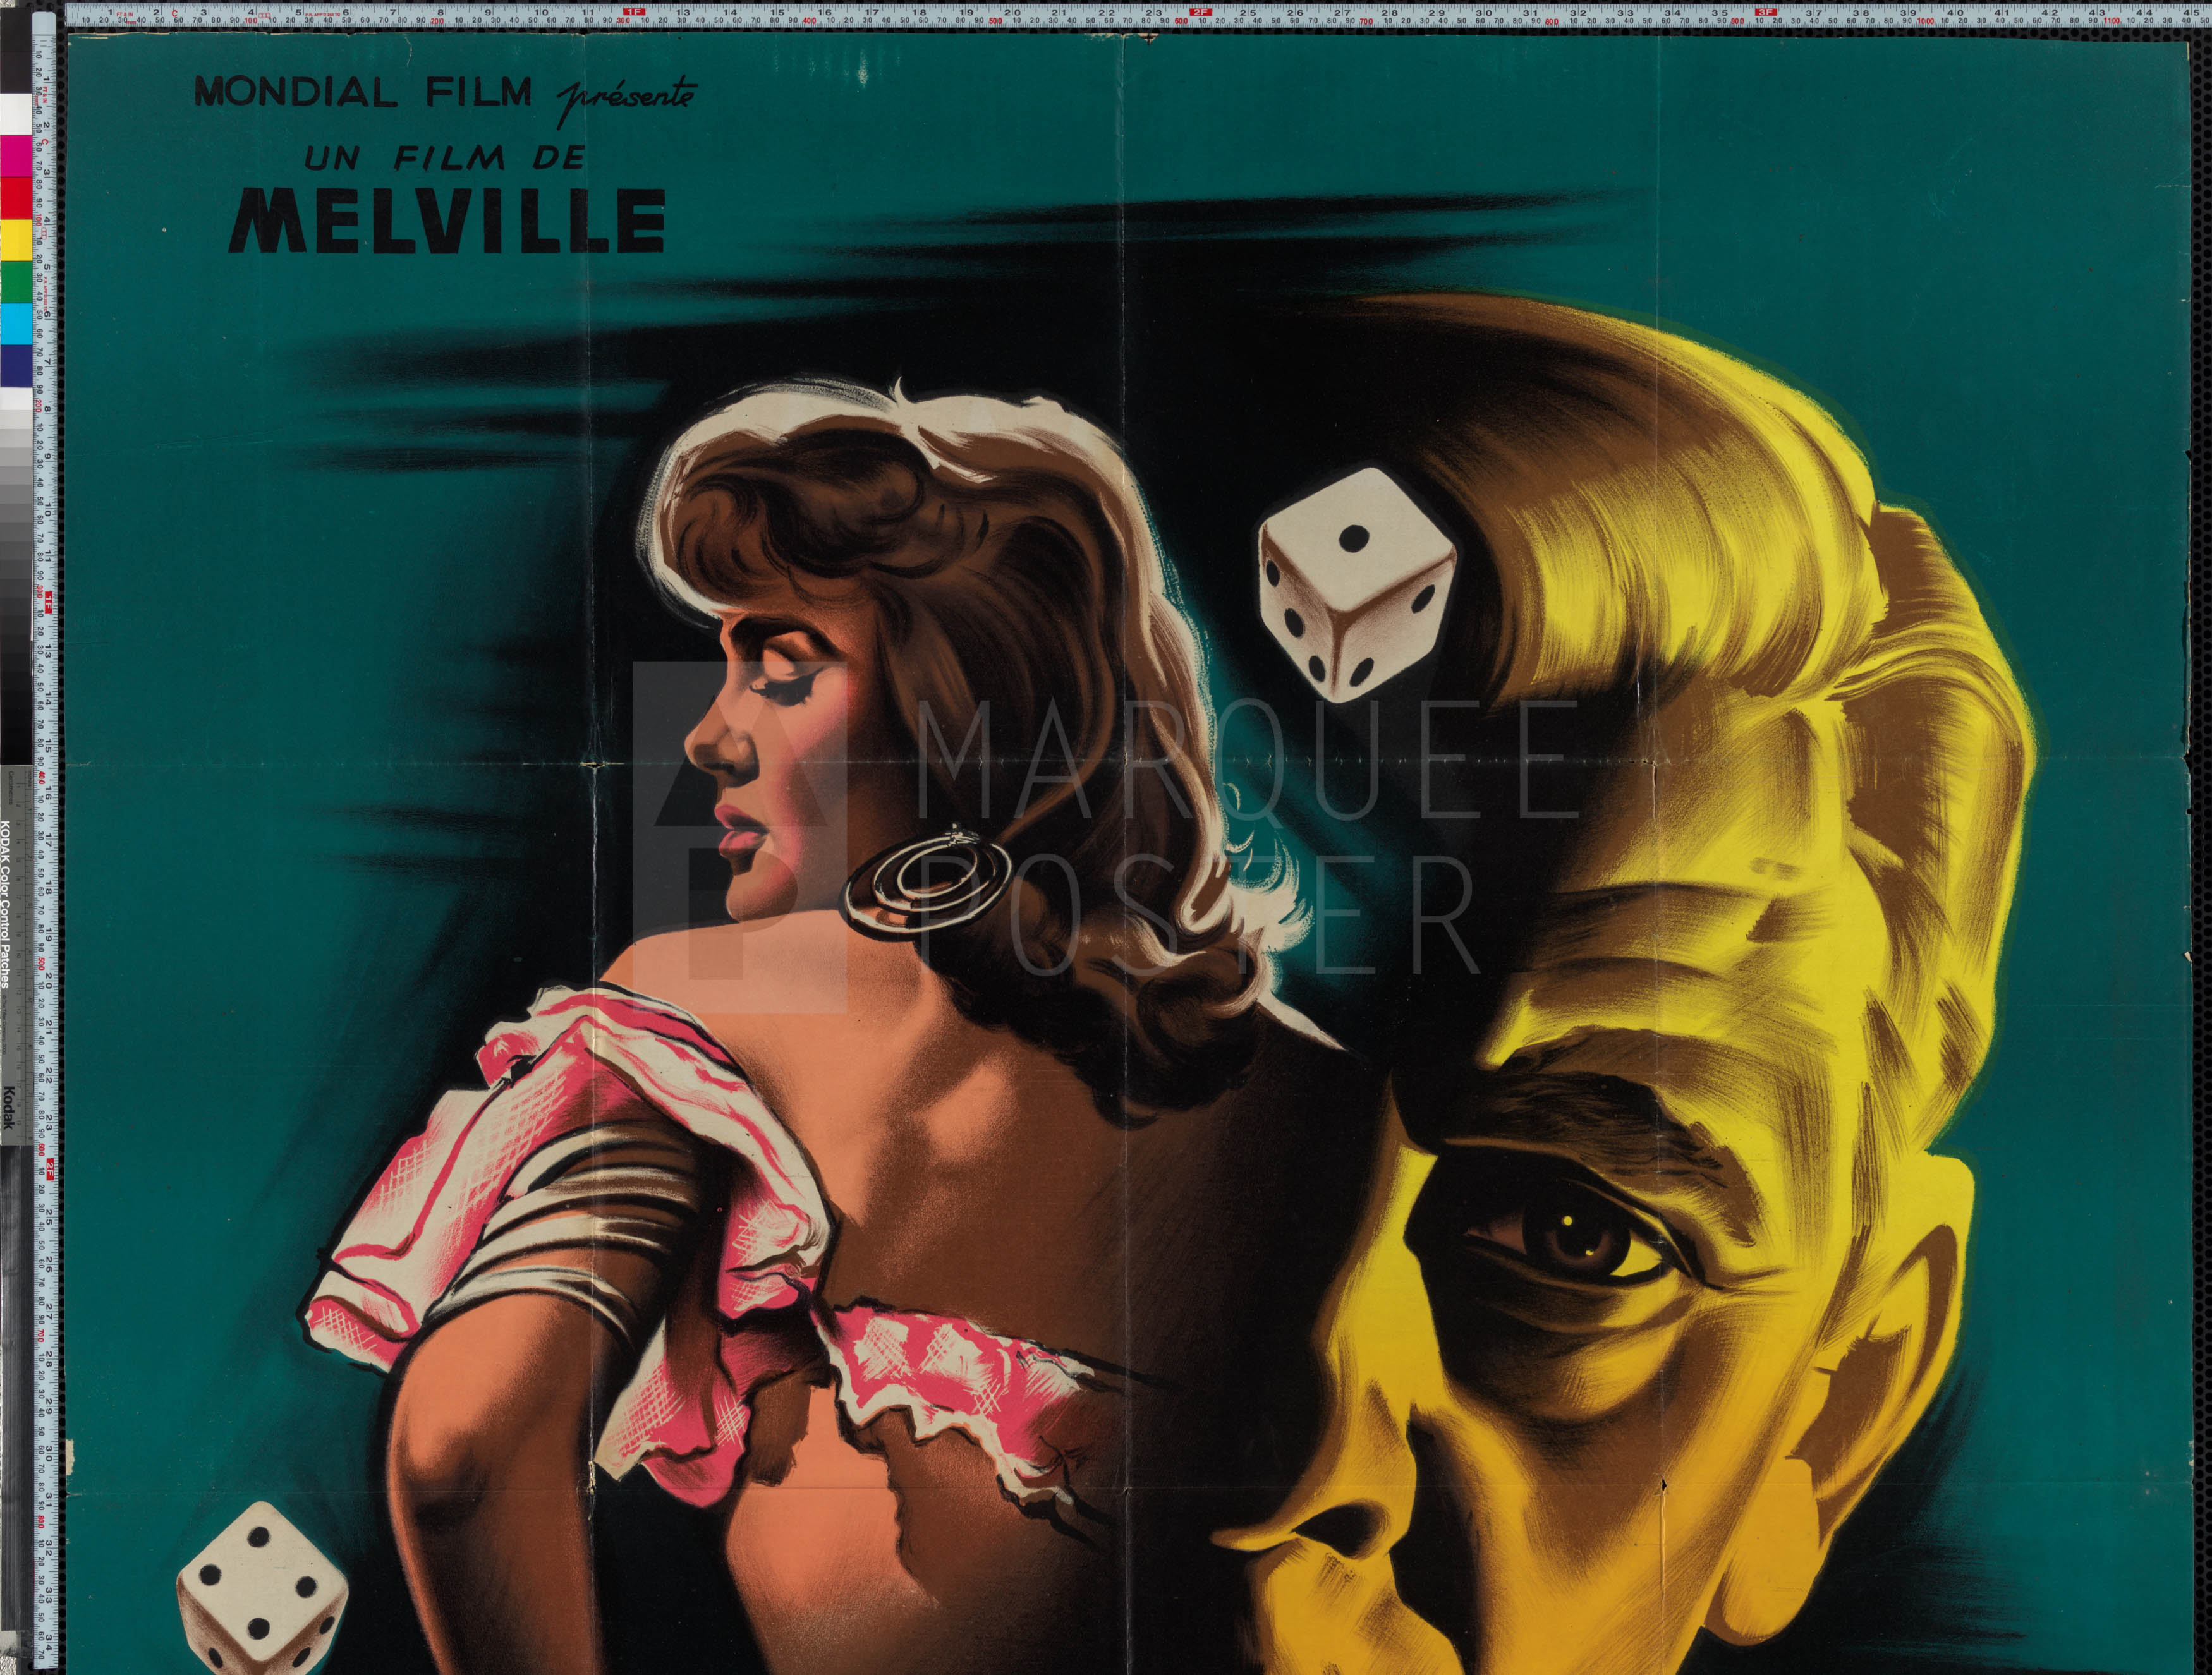 8-bob-the-gambler-french-1-panel-1956-02